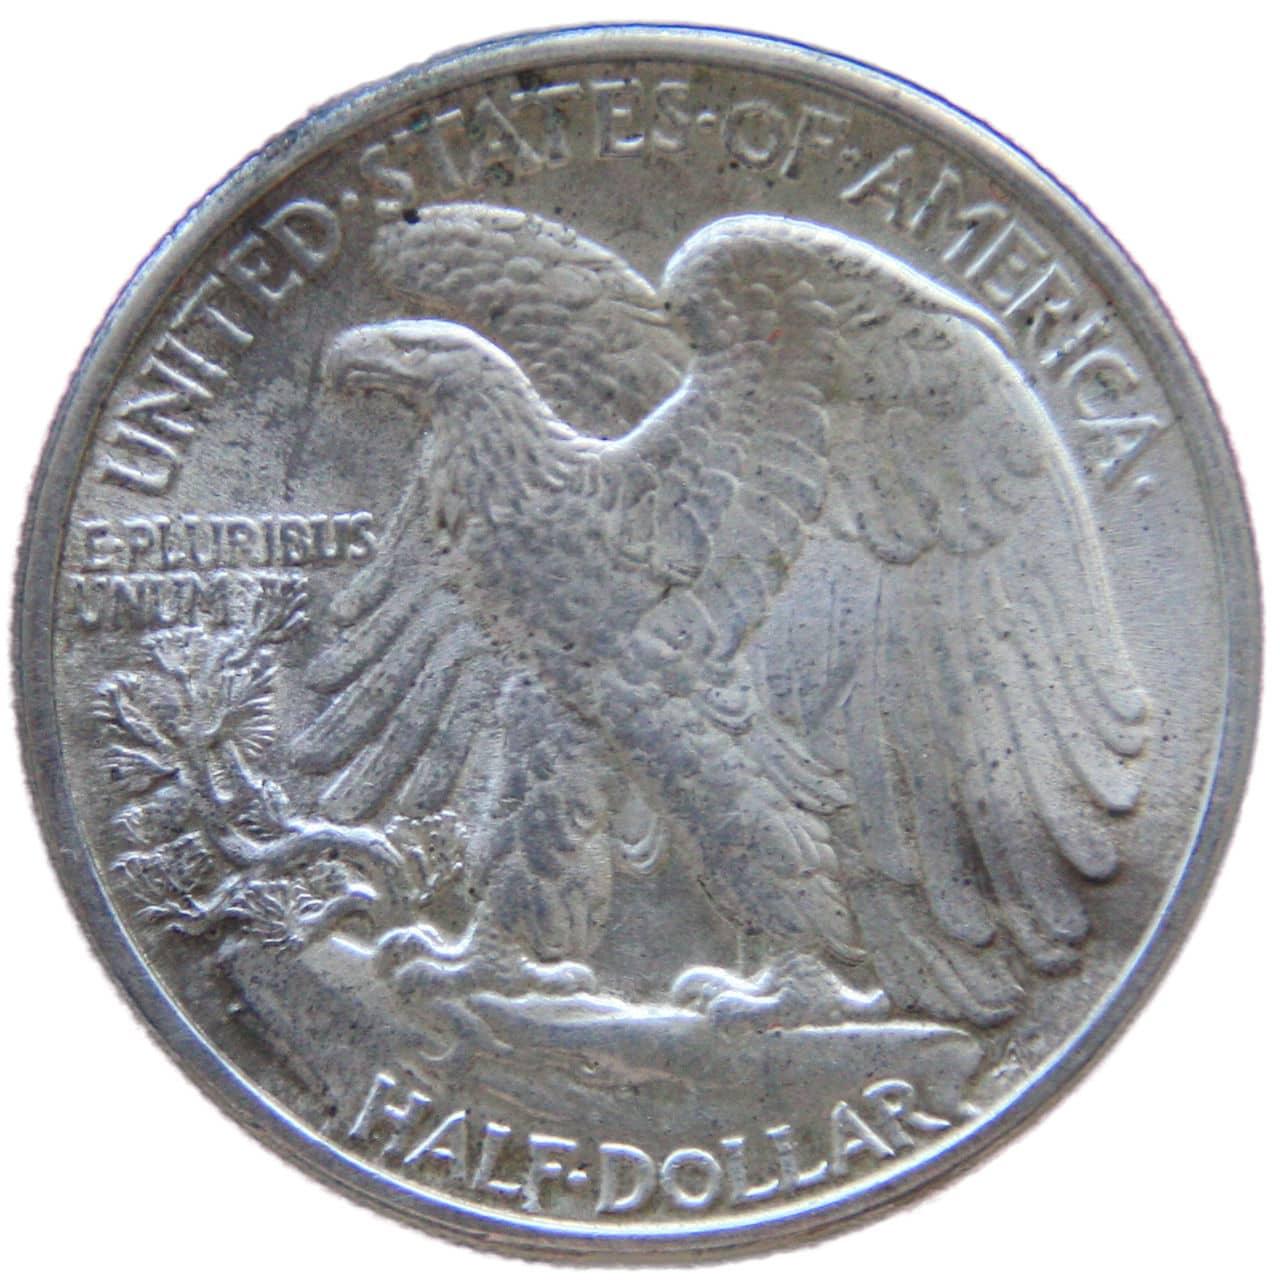 Medio dolar 1942 libertad andando 0133